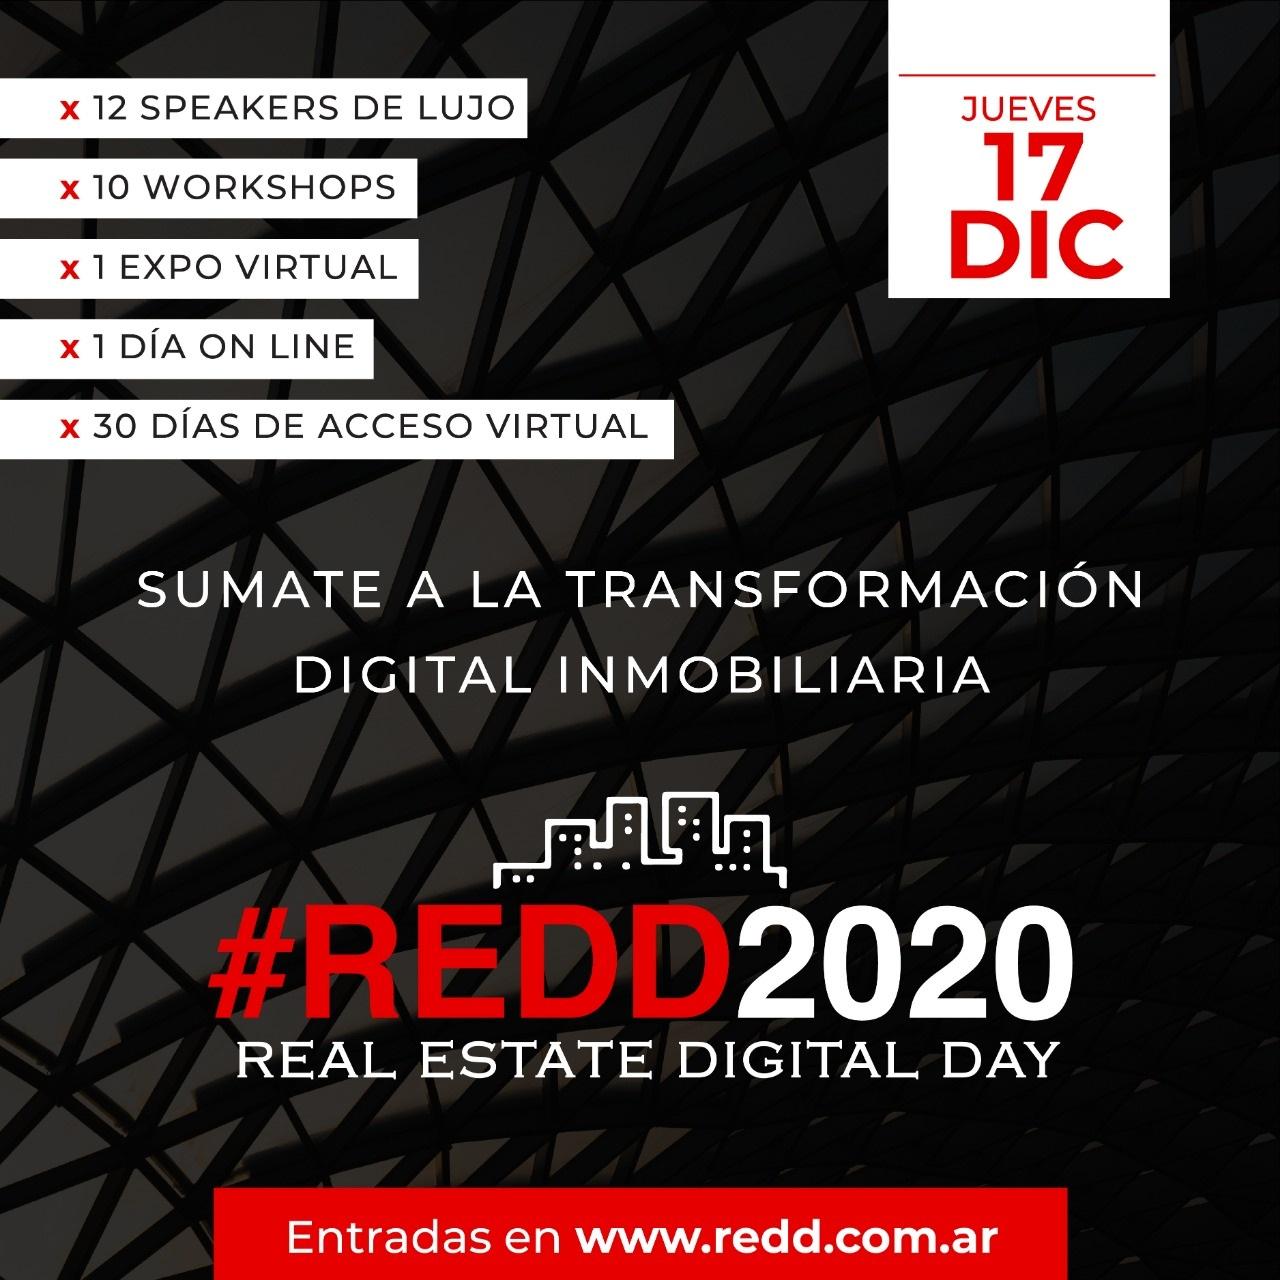 Redd 2020: llega Real Estate Digital Day